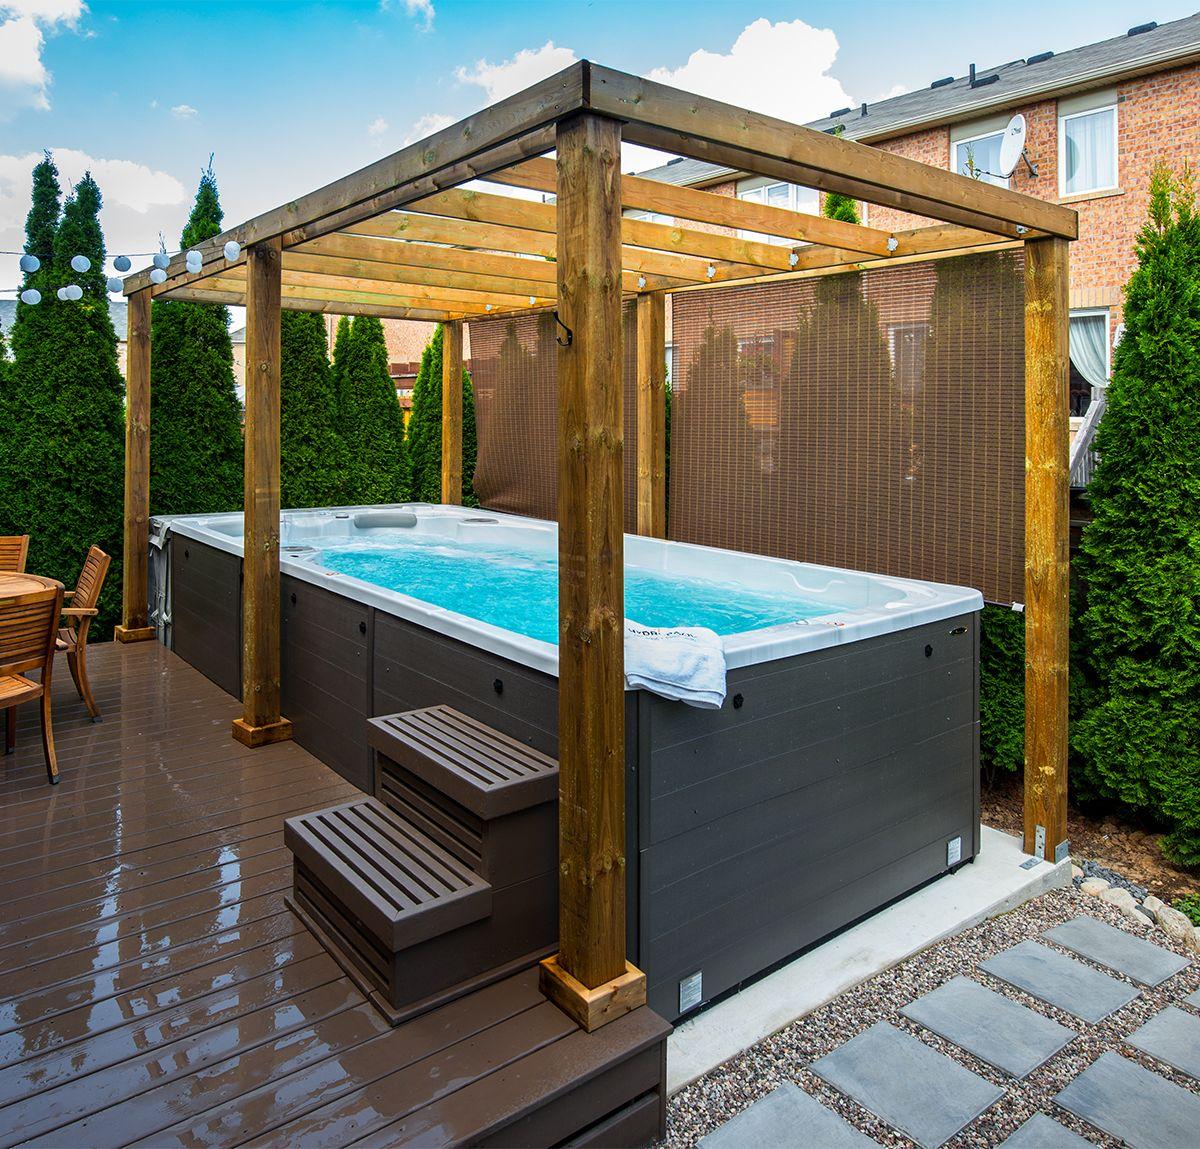 Swim Spas Durham Hot Tub Pool Supply Store Outdoor Pergola Swim Spa Landscaping Hot Tub Privacy